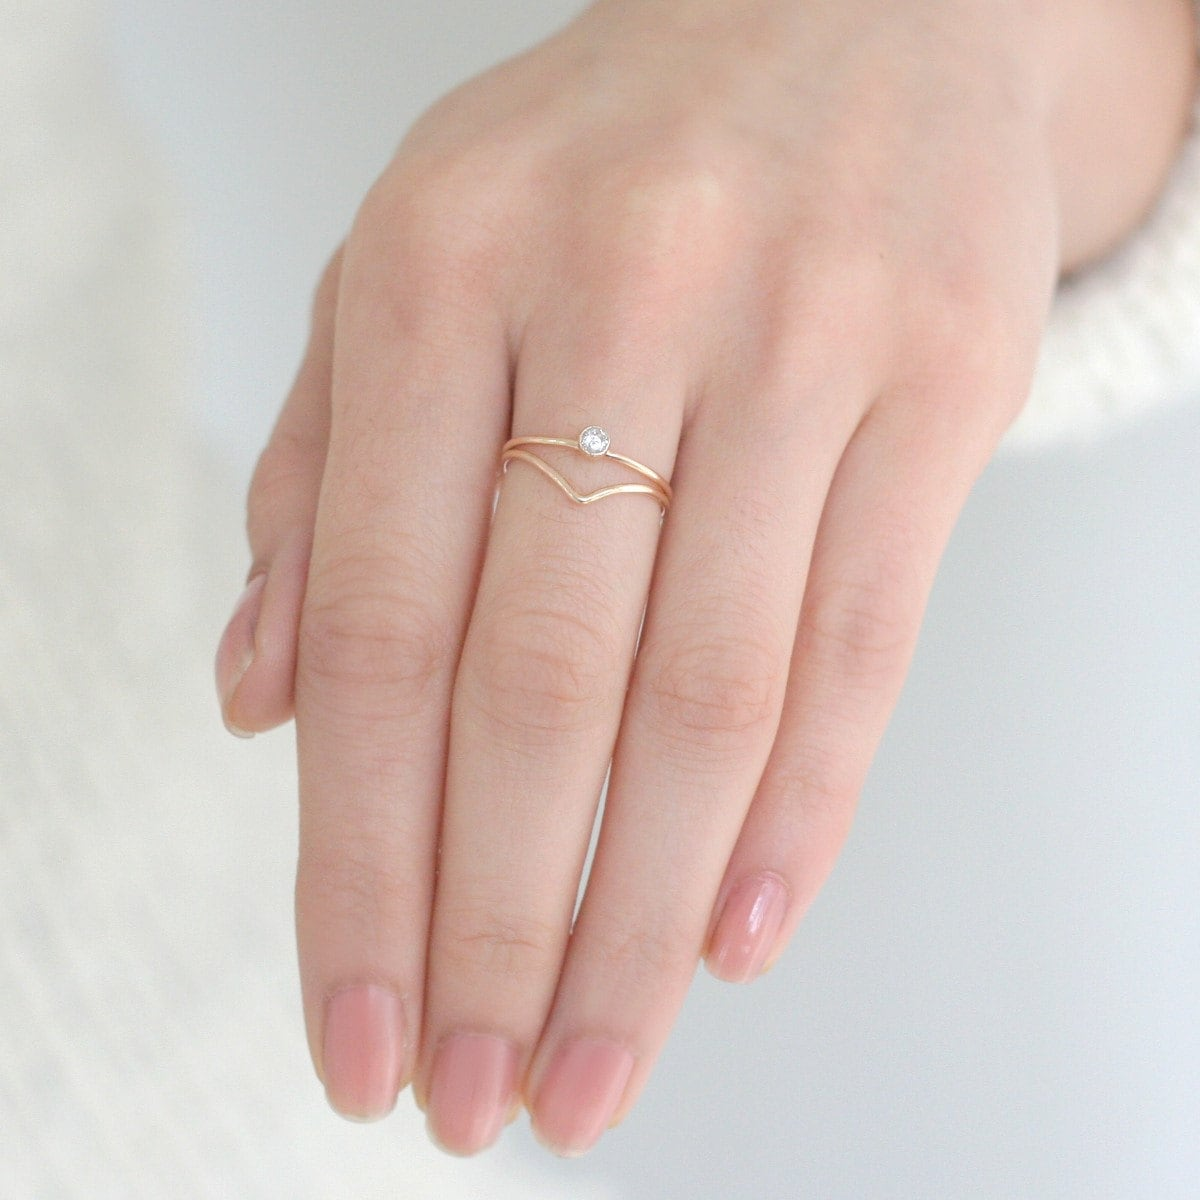 SOLID 14k gold ring set. chevron diamond ring. stackable wedding rings. engagement ring. wedding ring set. geometric stackable wedding bands